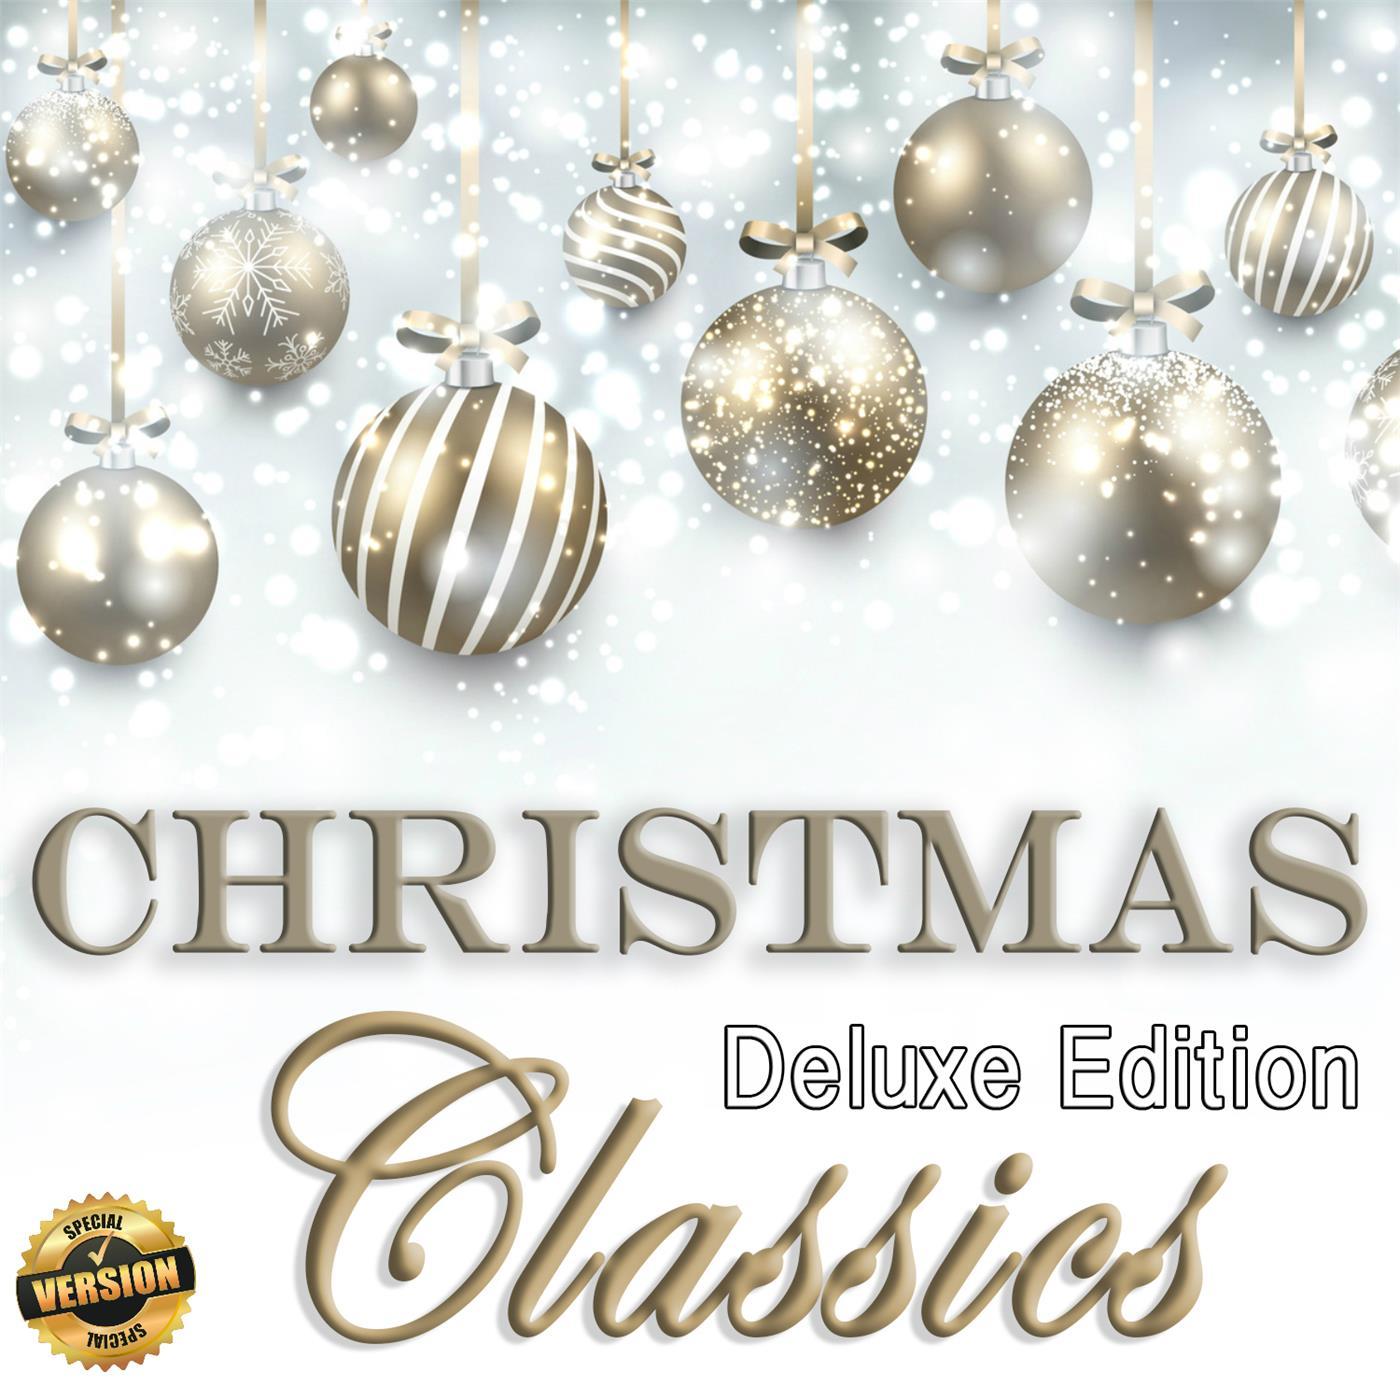 christmas christmas classics deluxe edition - Christmas Classics Songs